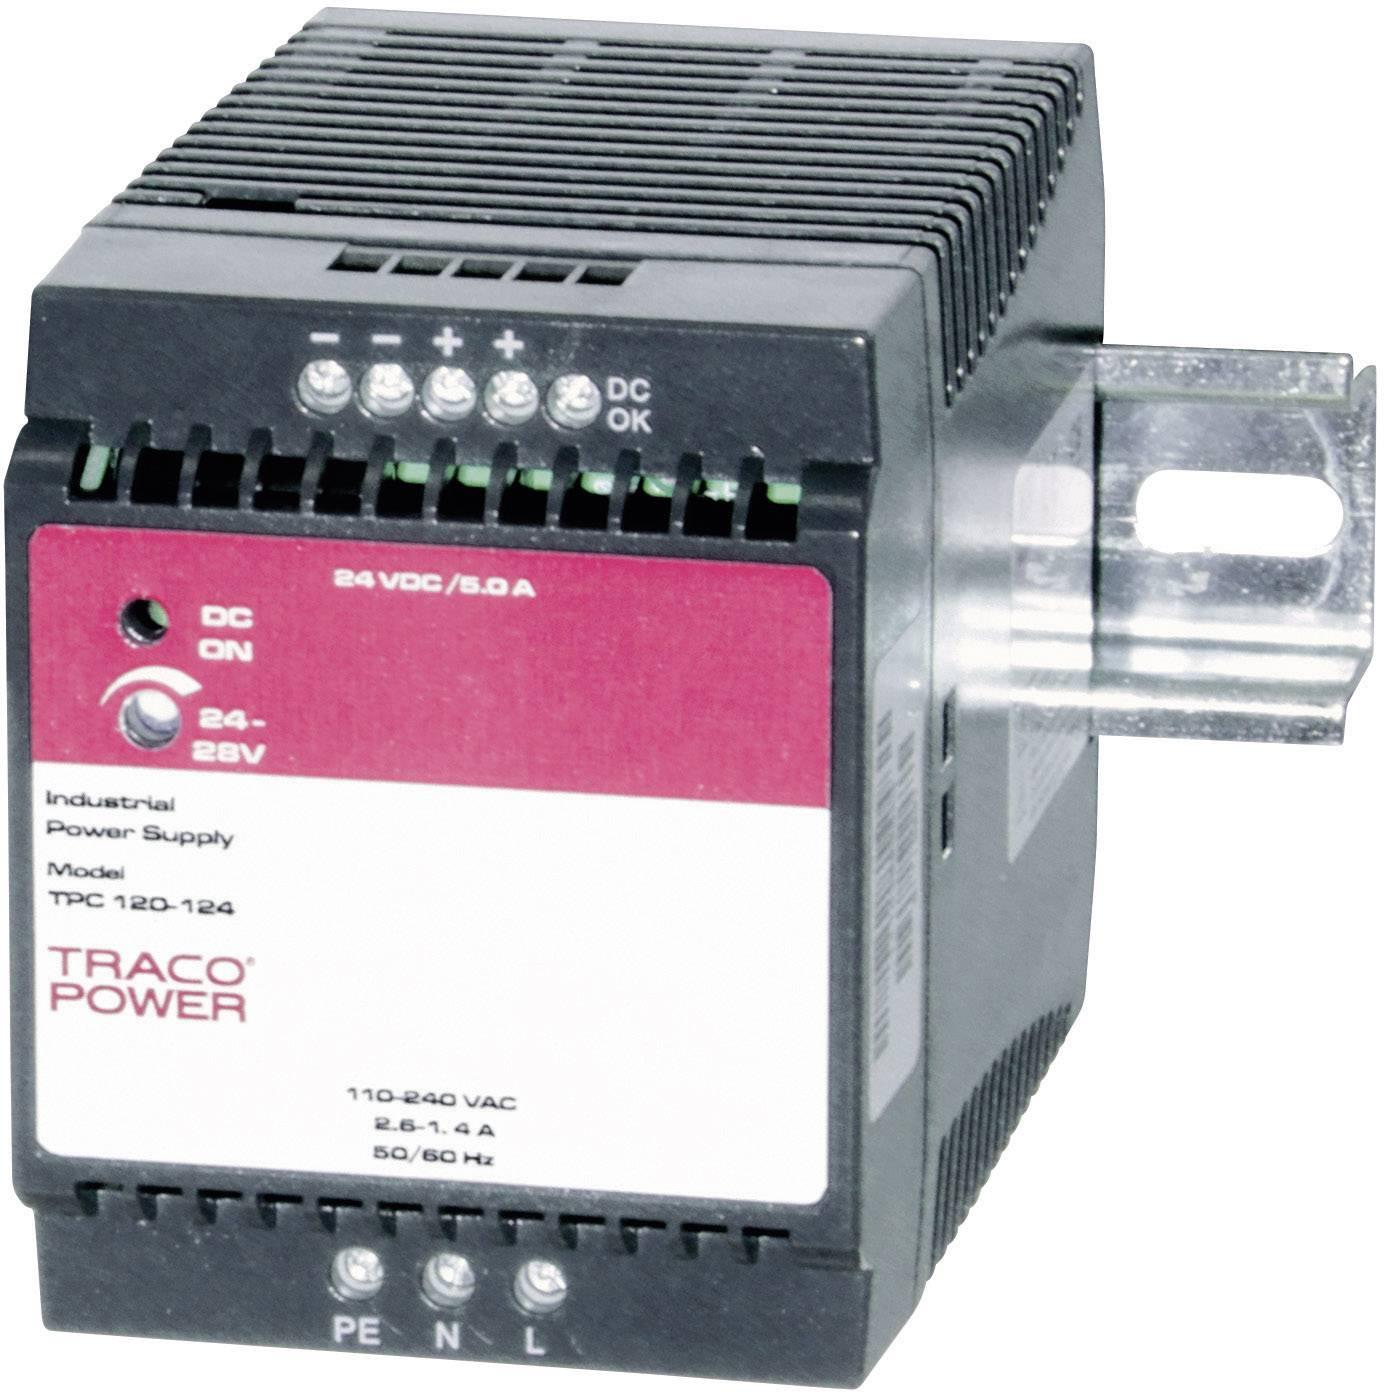 Zdroj na DIN lištu TracoPower TPC 120-148, 48 - 56 V/DC, 2,5 A